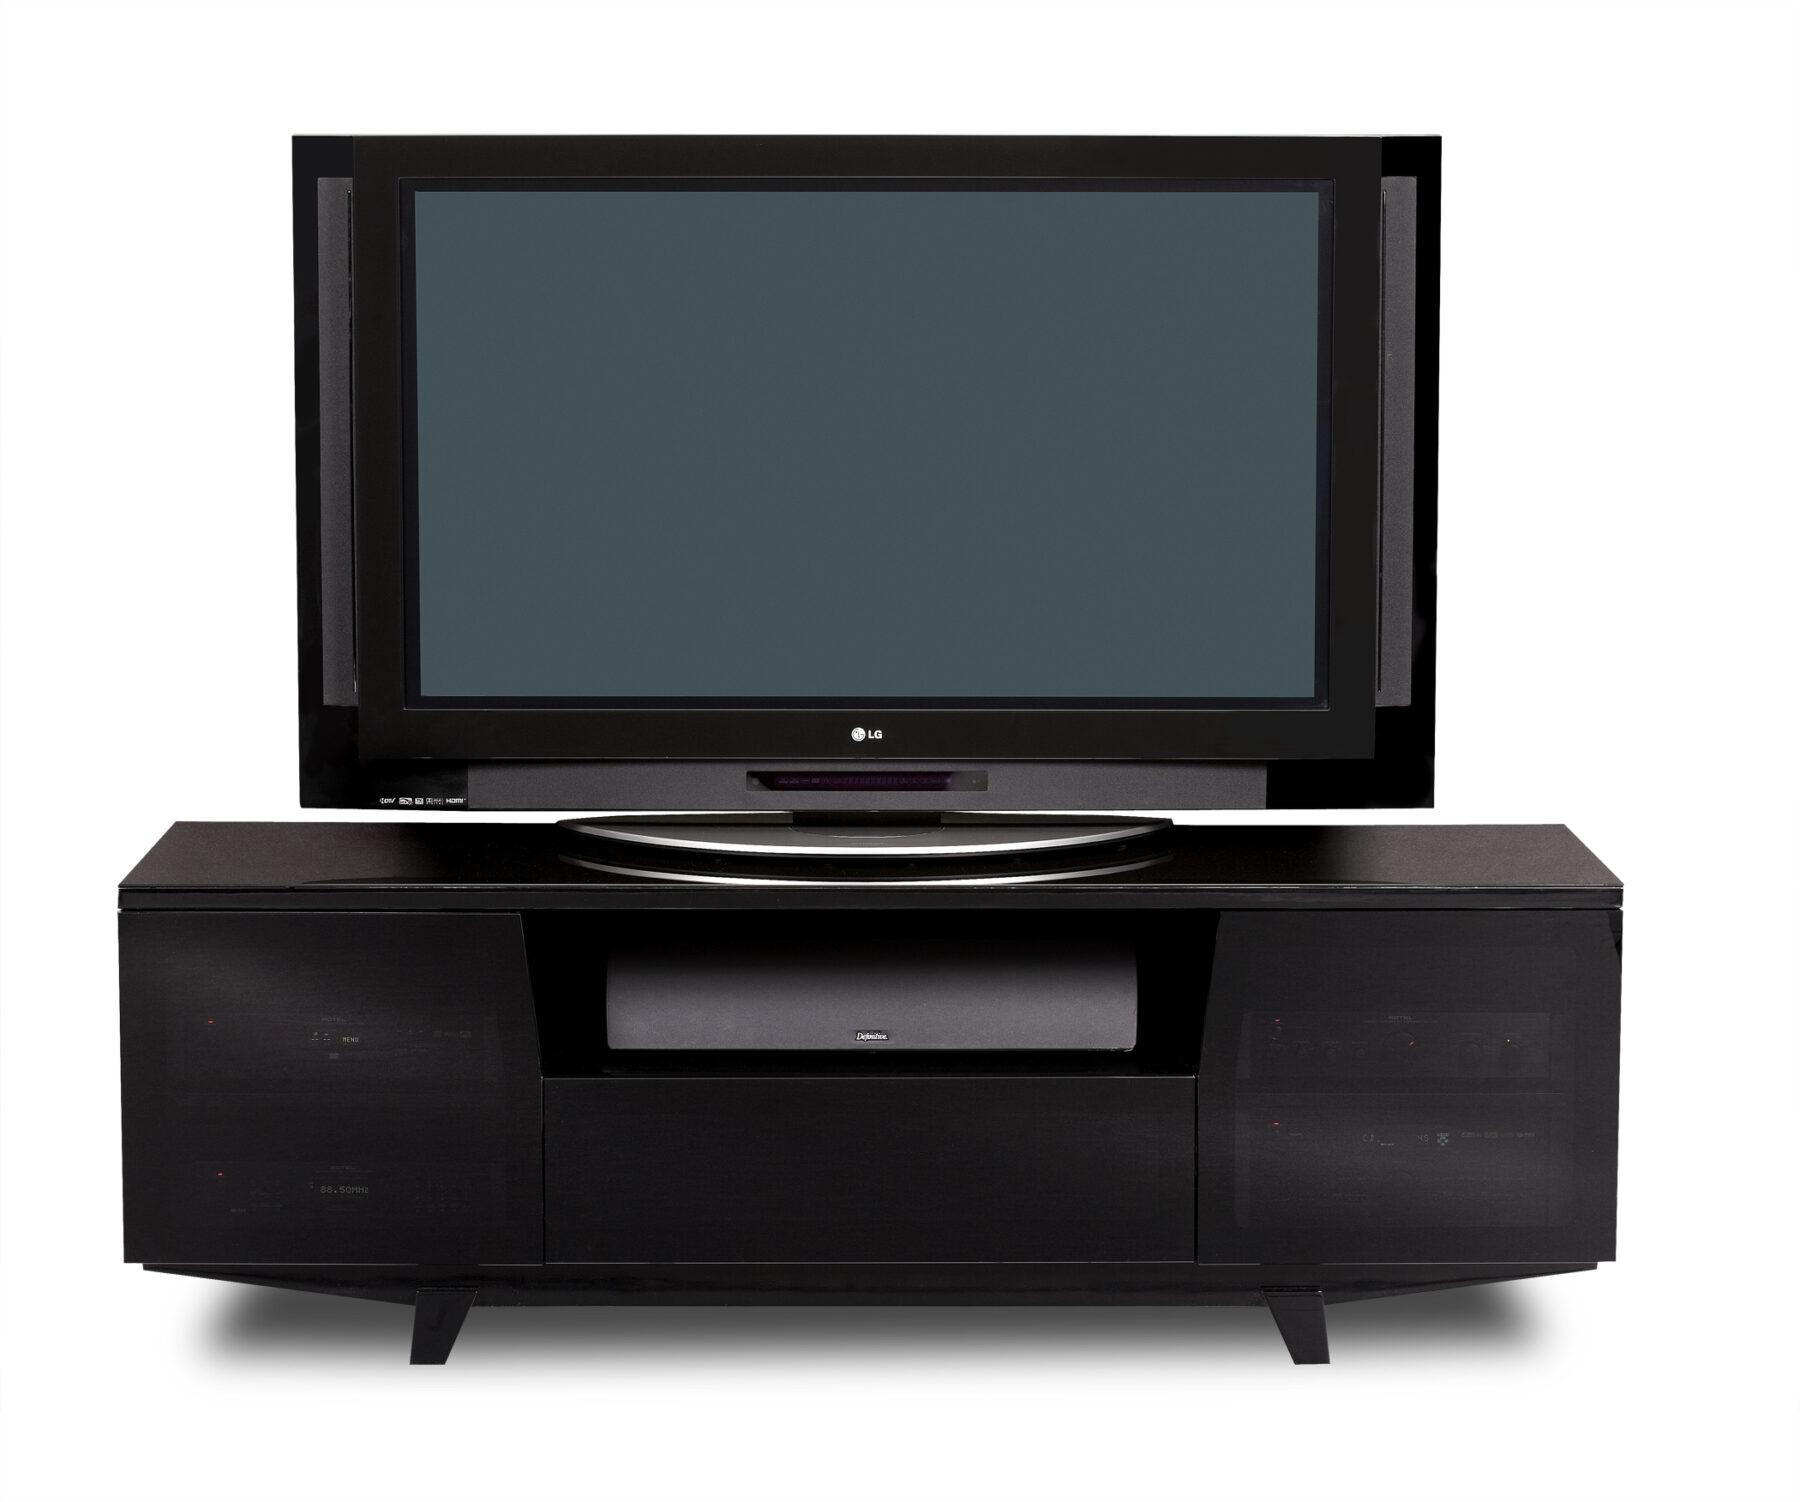 marina-8729-2-black-bdi-modern-tv-cabinet-4